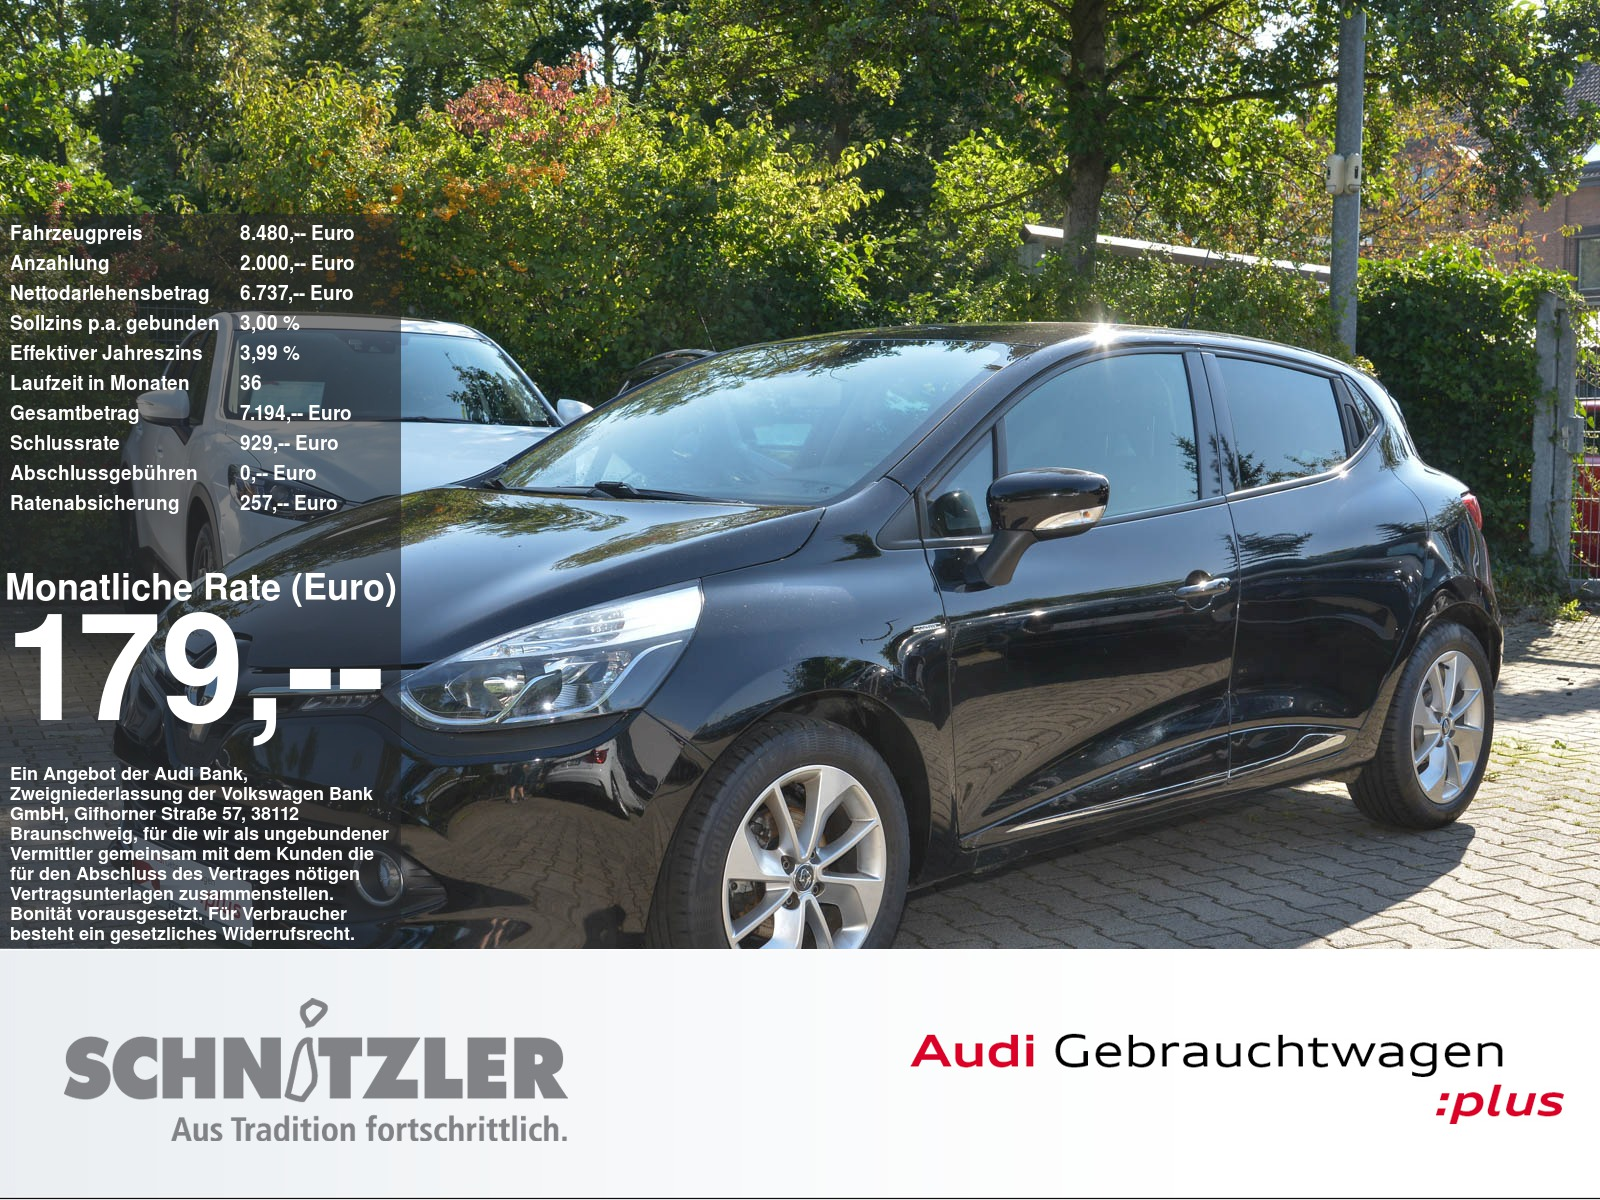 Renault Clio IV Limited Energy 0.9 TCe 90 eco² Navi/Bluetooth/Bass-Reflex/+++, Jahr 2016, Benzin